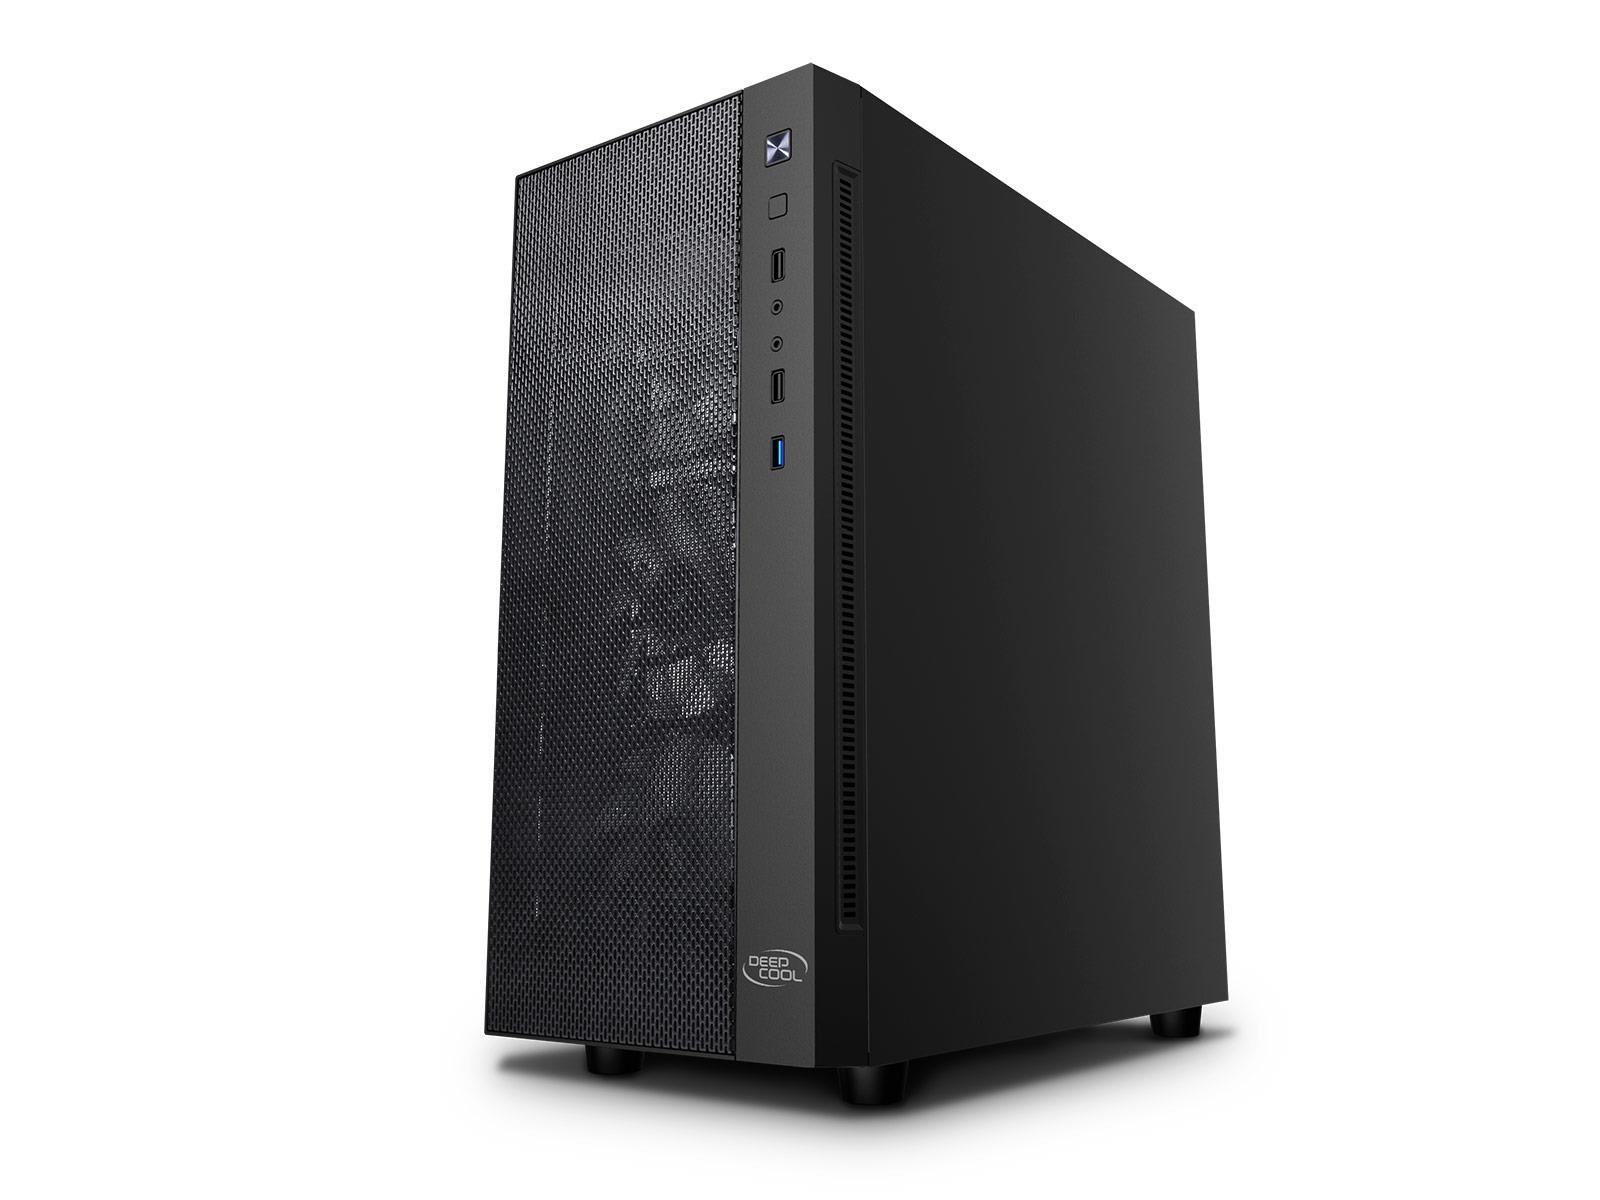 "Kompiuteris ""eSports i9 Galaxy""   Intel® Core™ i9-10850K (3.60GHz iki 5.20Ghz)   16GB RAM   512GB SSD   GeForce RTX 3070 8G   201171_a"